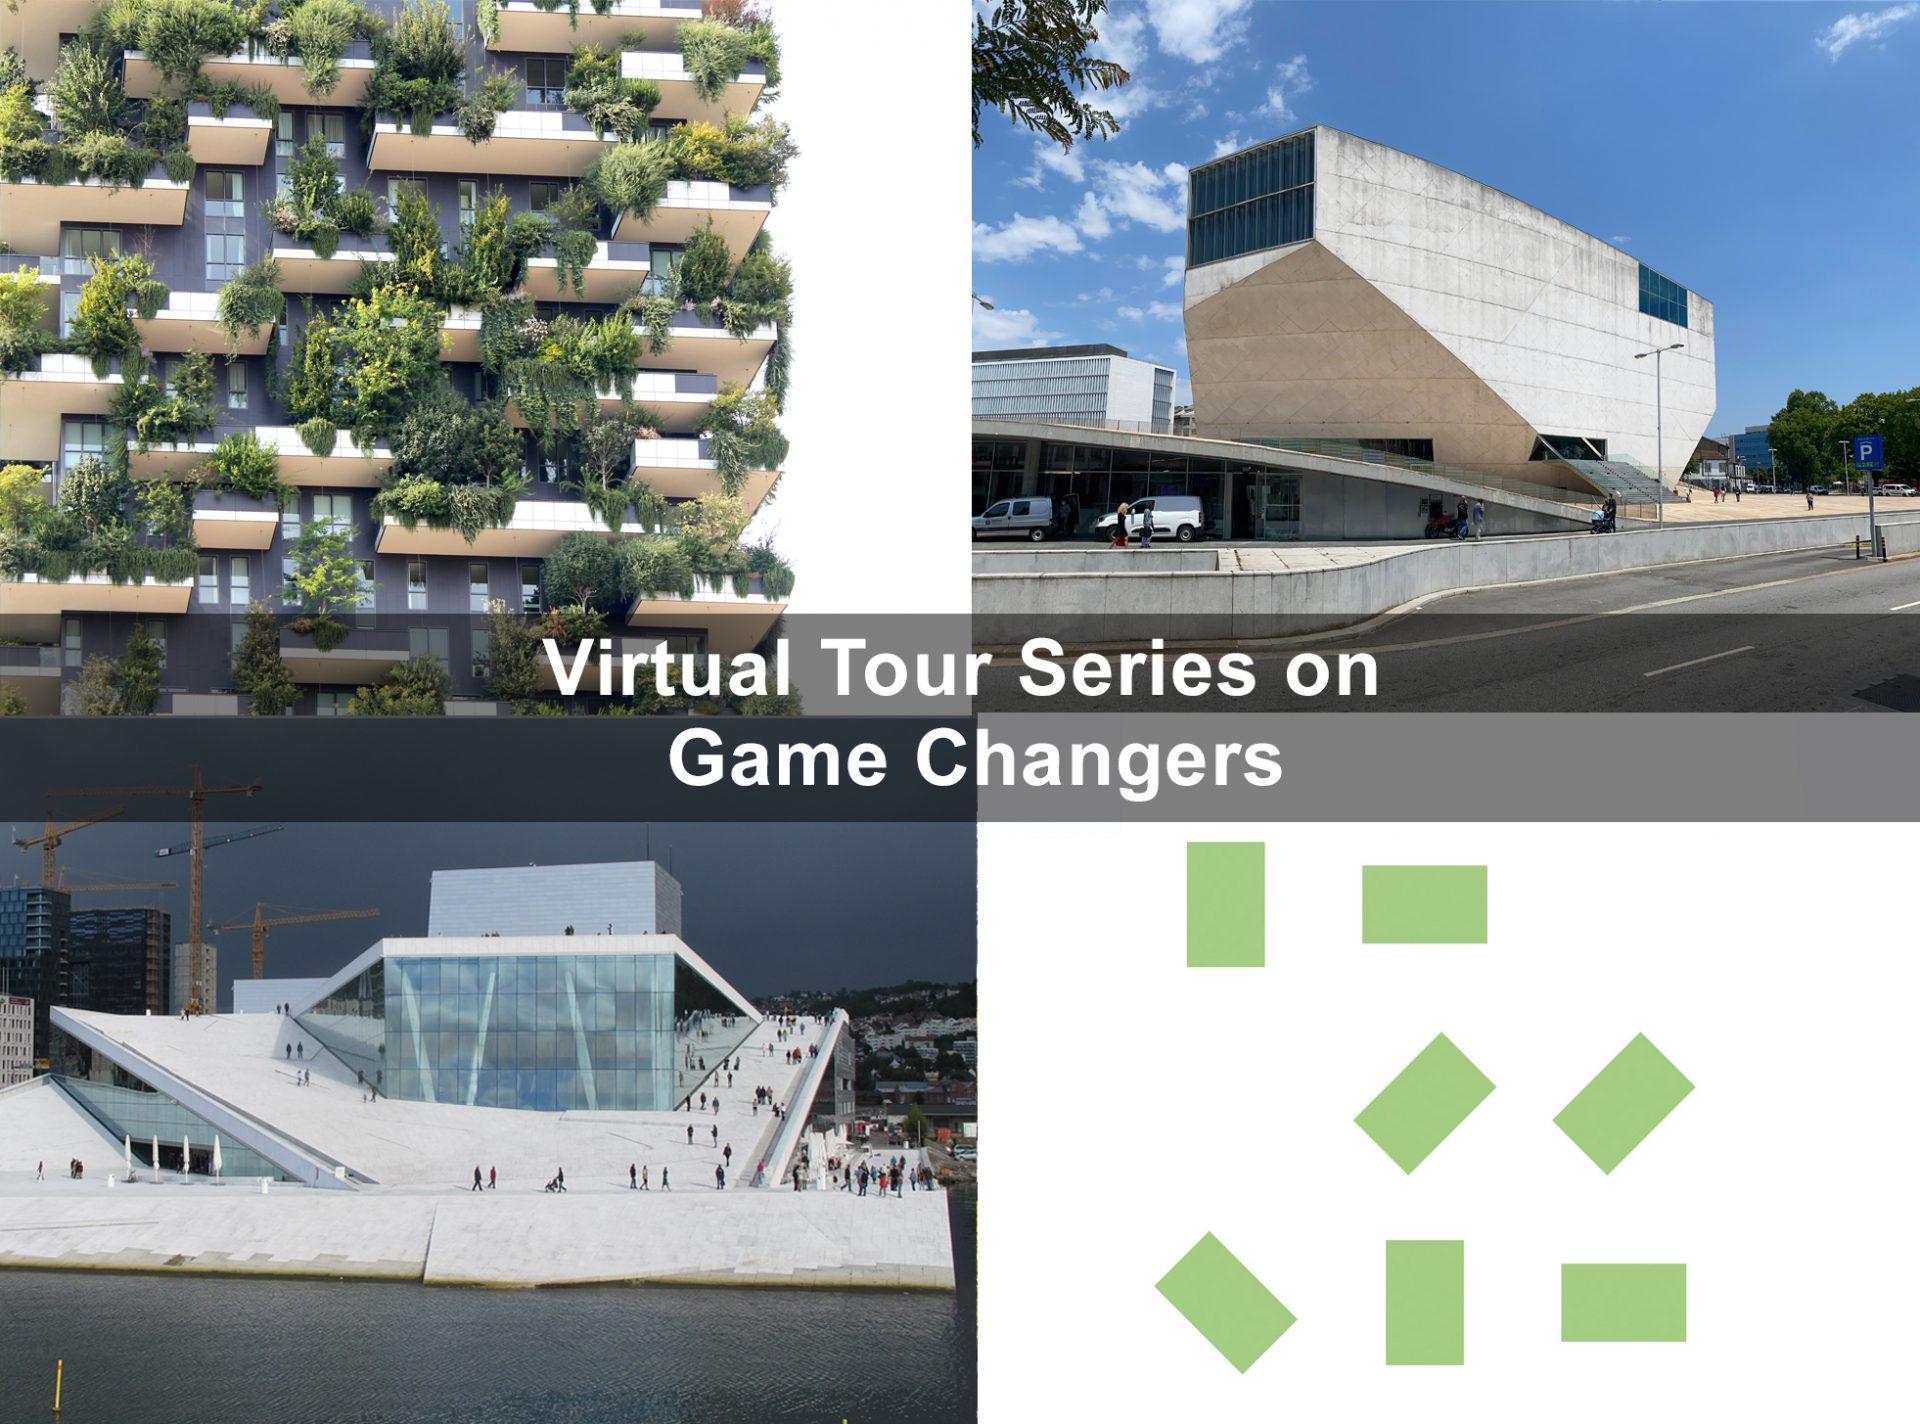 virtual tour series game changers